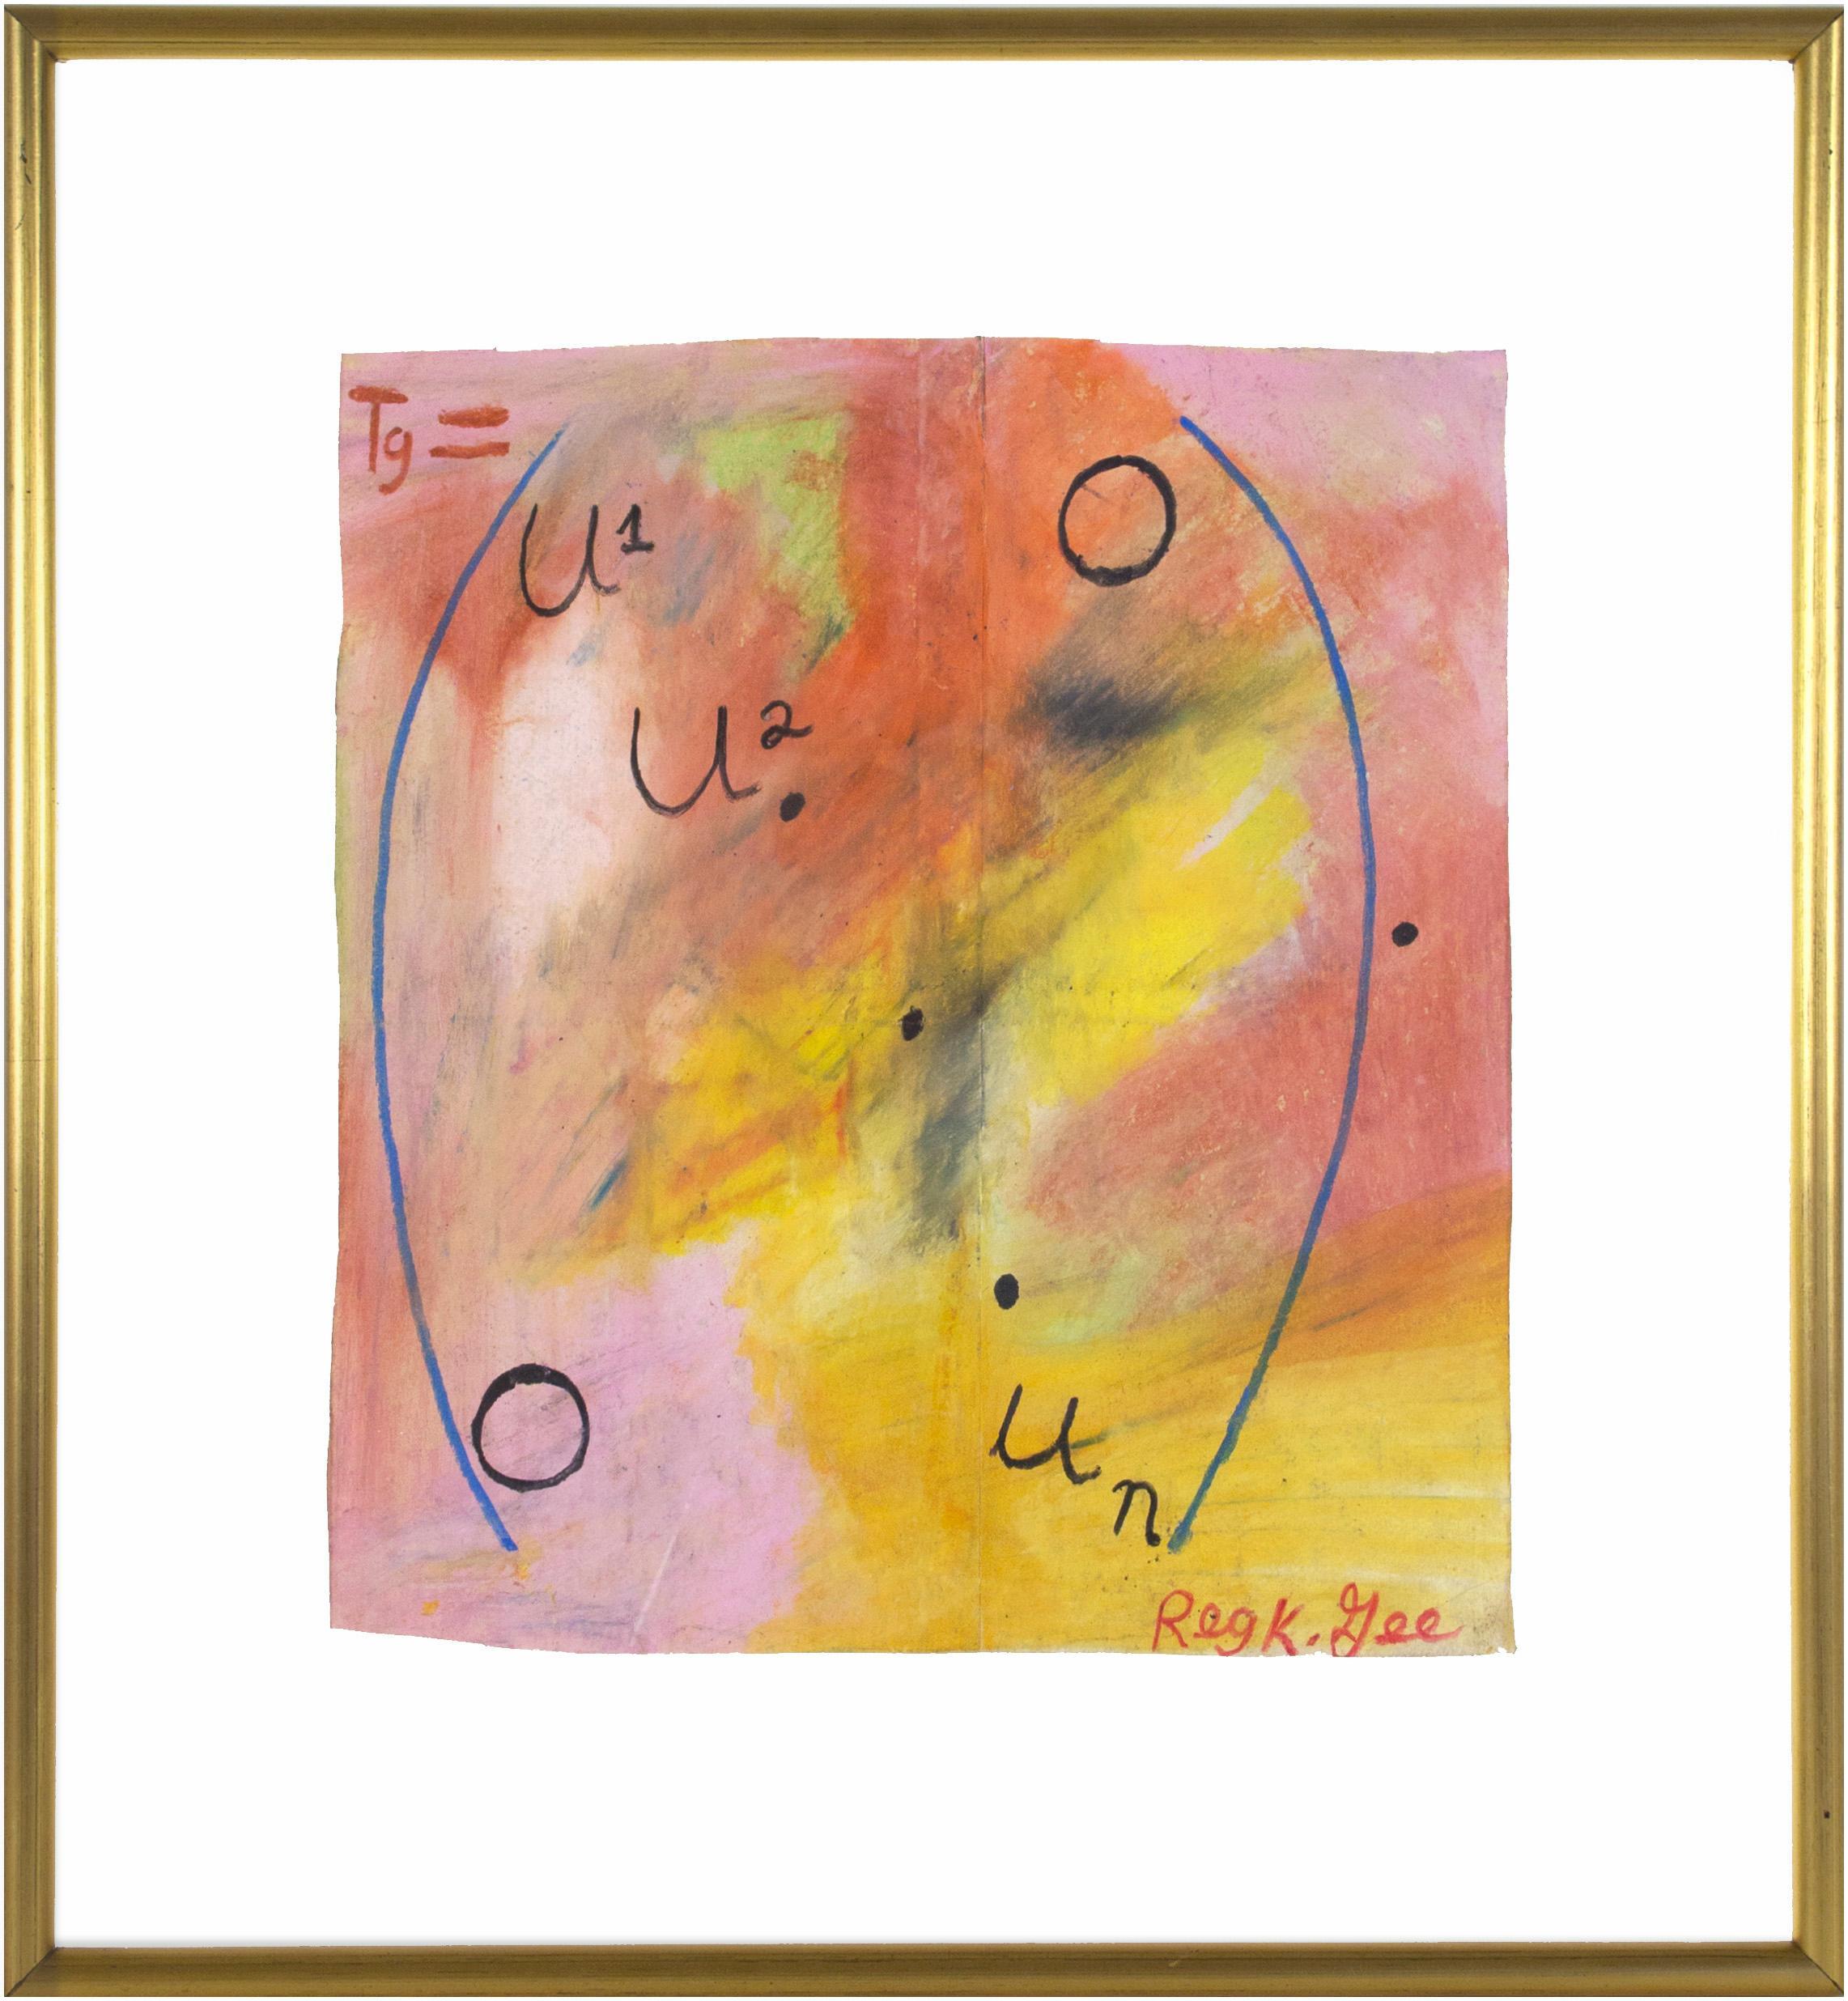 Reginald K. Gee Abstract Drawings and Watercolors